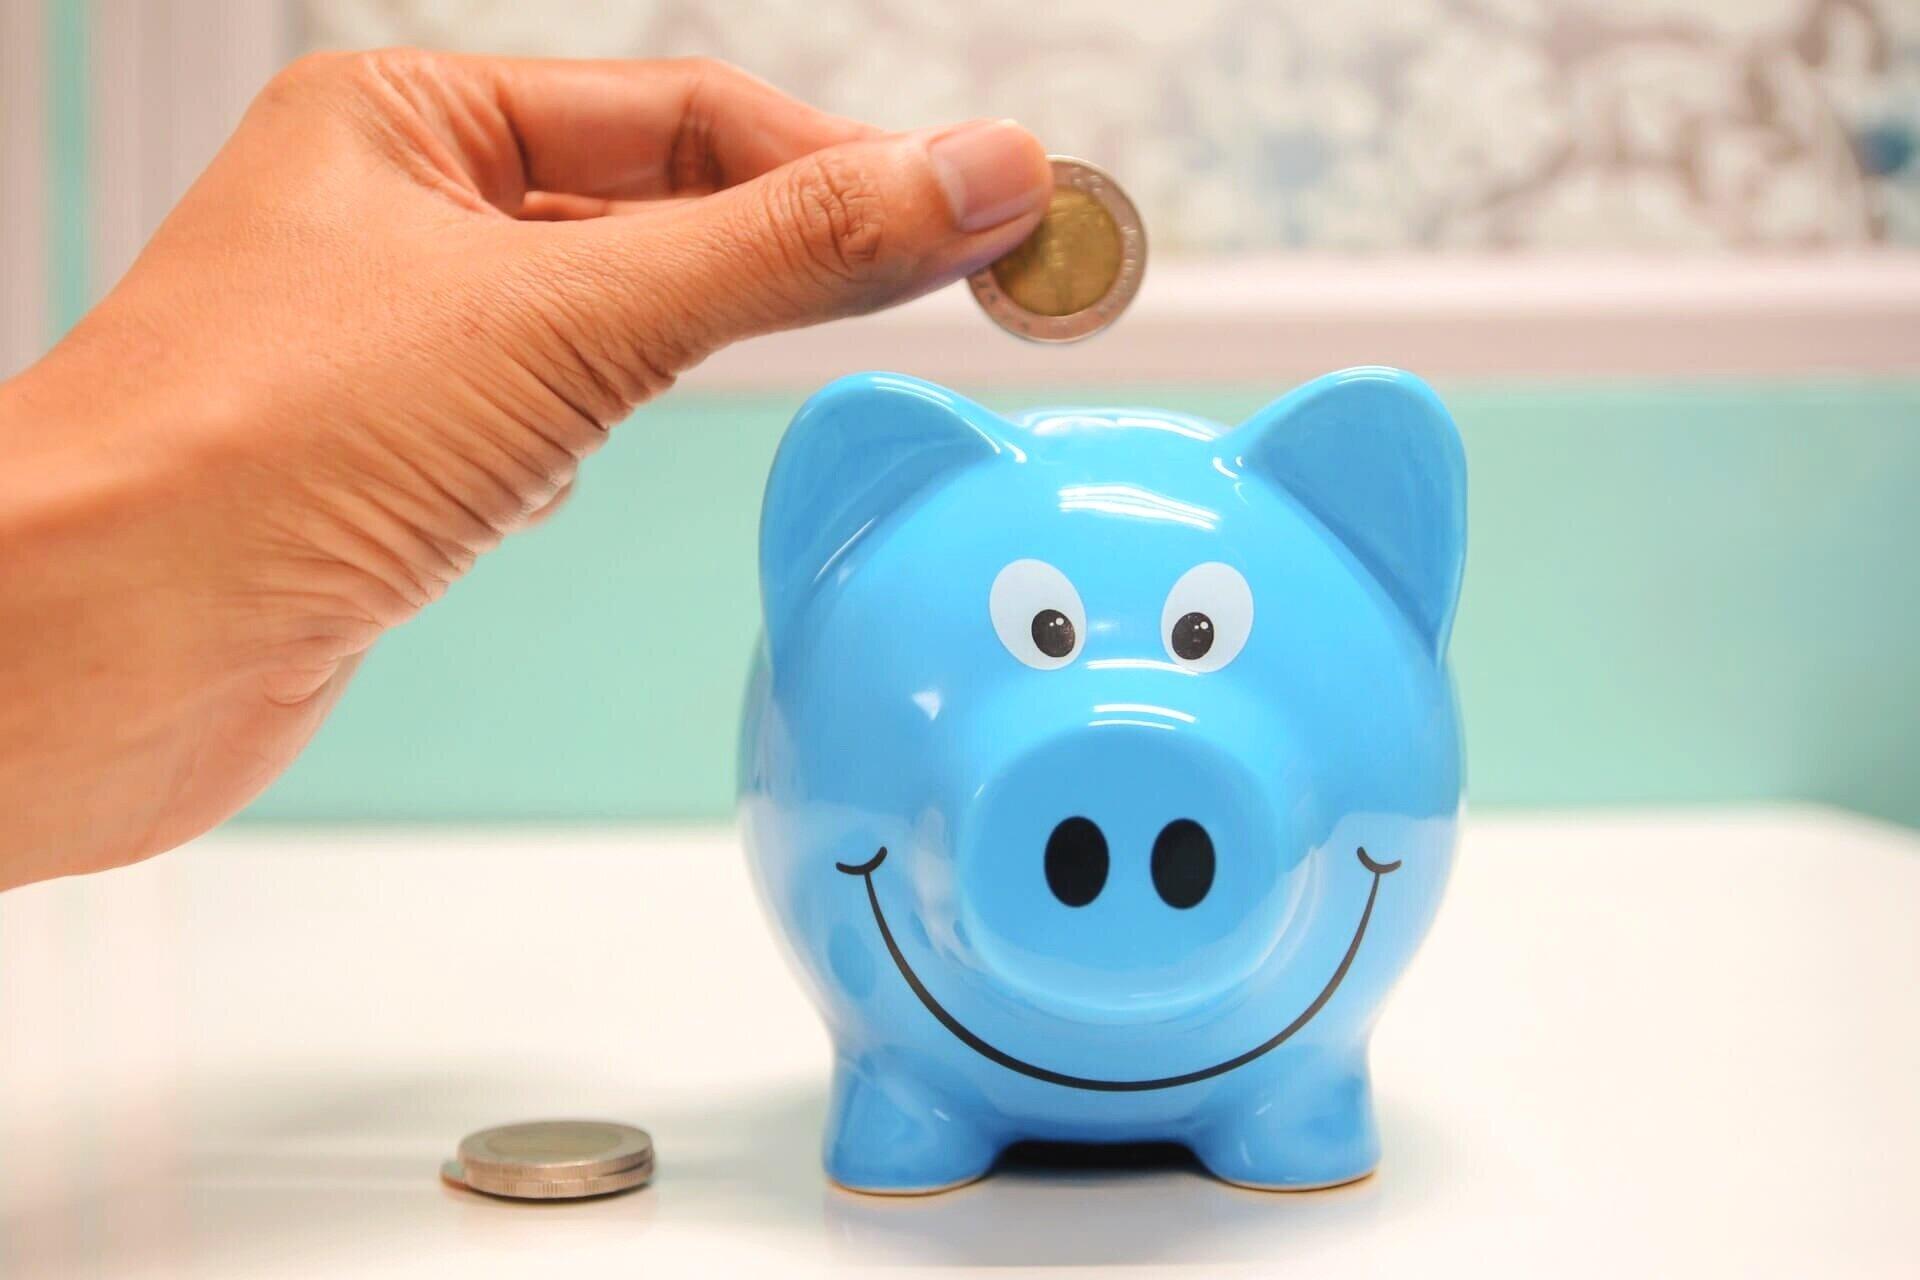 minimalray-money-problems-4.jpg